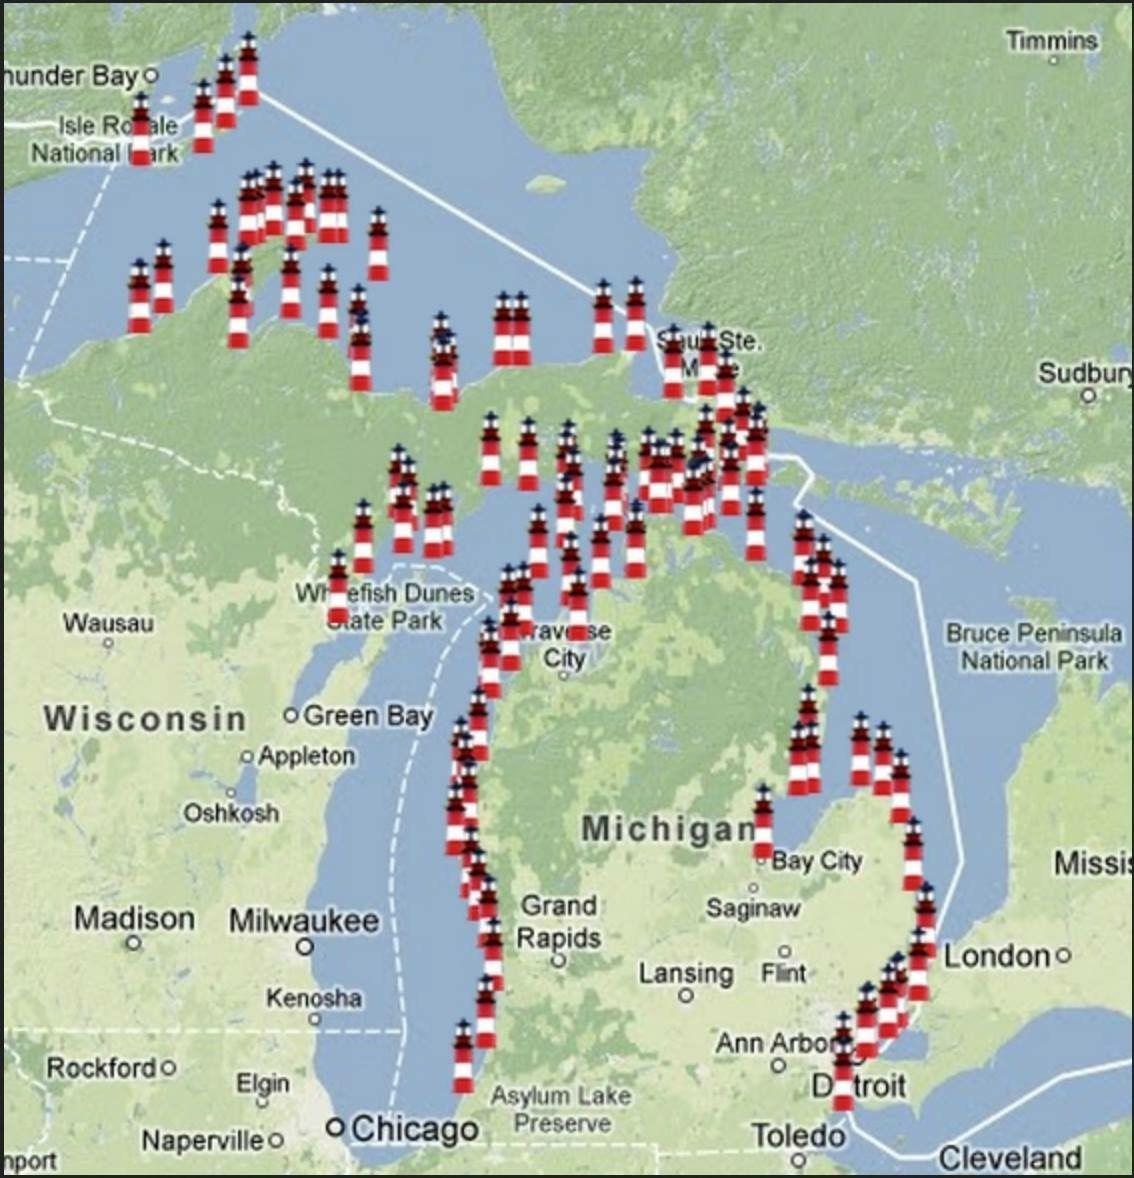 Michigan Lighthouses Map Pin by Barbara Mills on Michigan Lighthouses   Lighthouse  Michigan Lighthouses Map